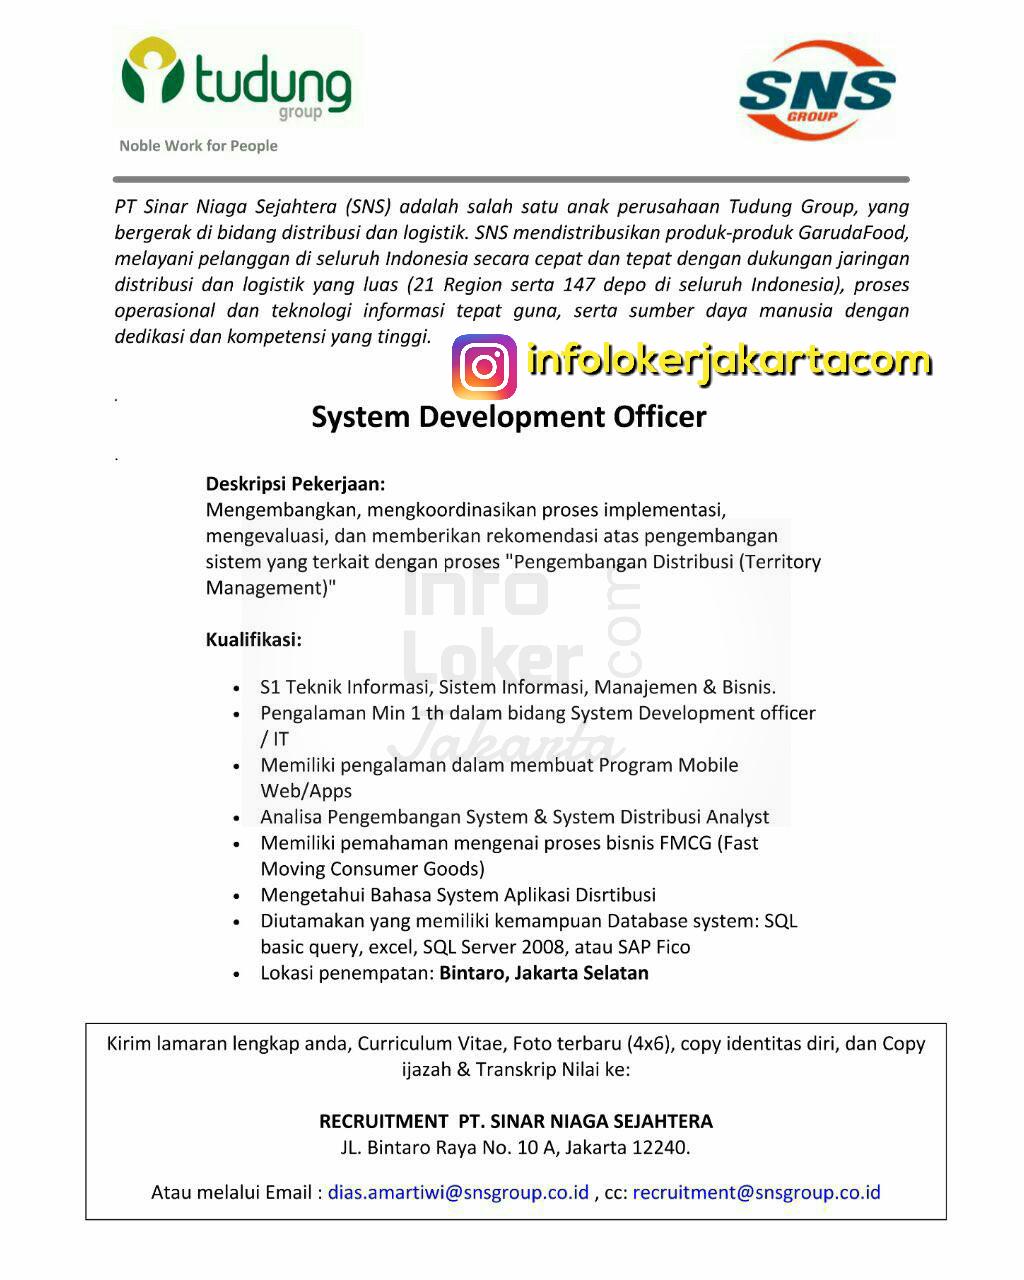 Lowongan Kerja PT. Sinar Niaga Sejahtera ( SNS ) Jakarta April 2017